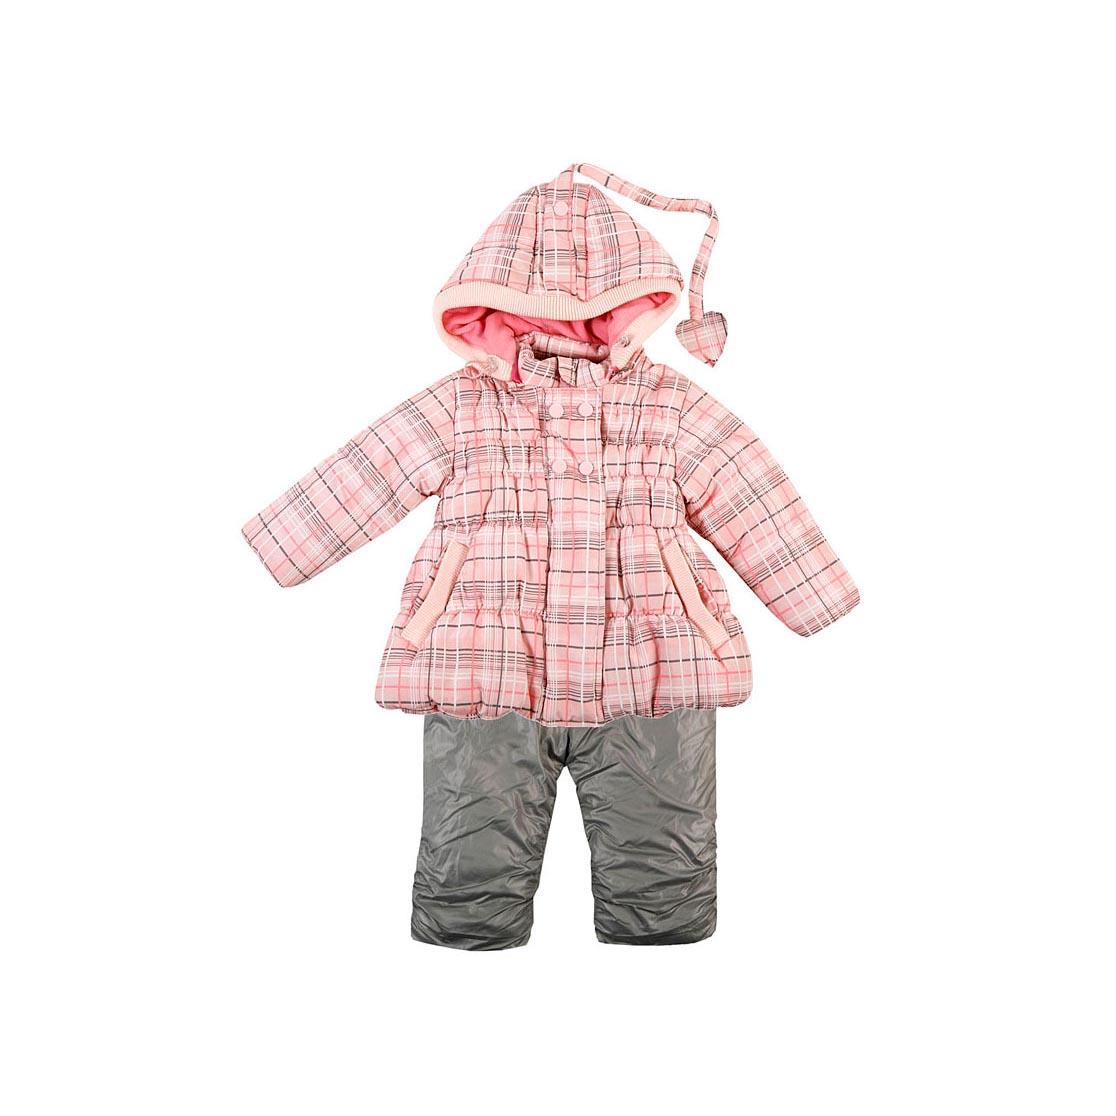 Комплект куртка + полукомбинезон PlayToday Малютка с 3 мес. размер 62<br>